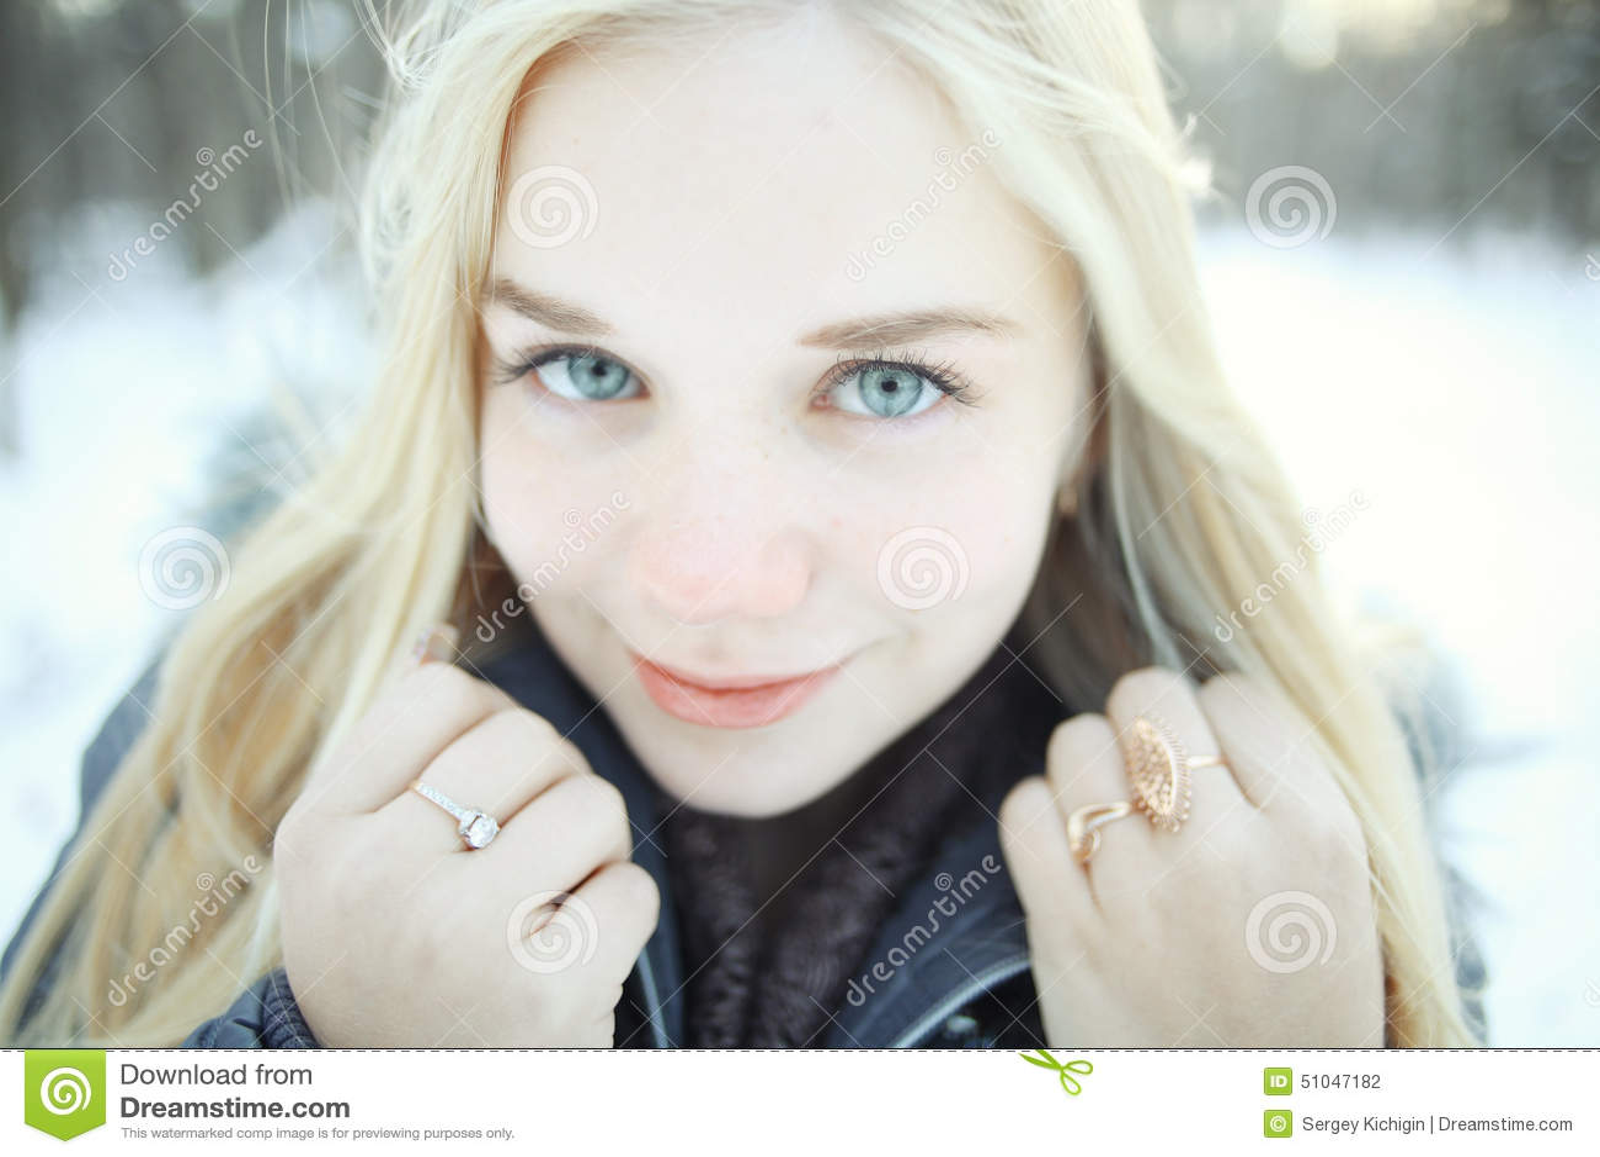 Chaud adolescent blondes nue